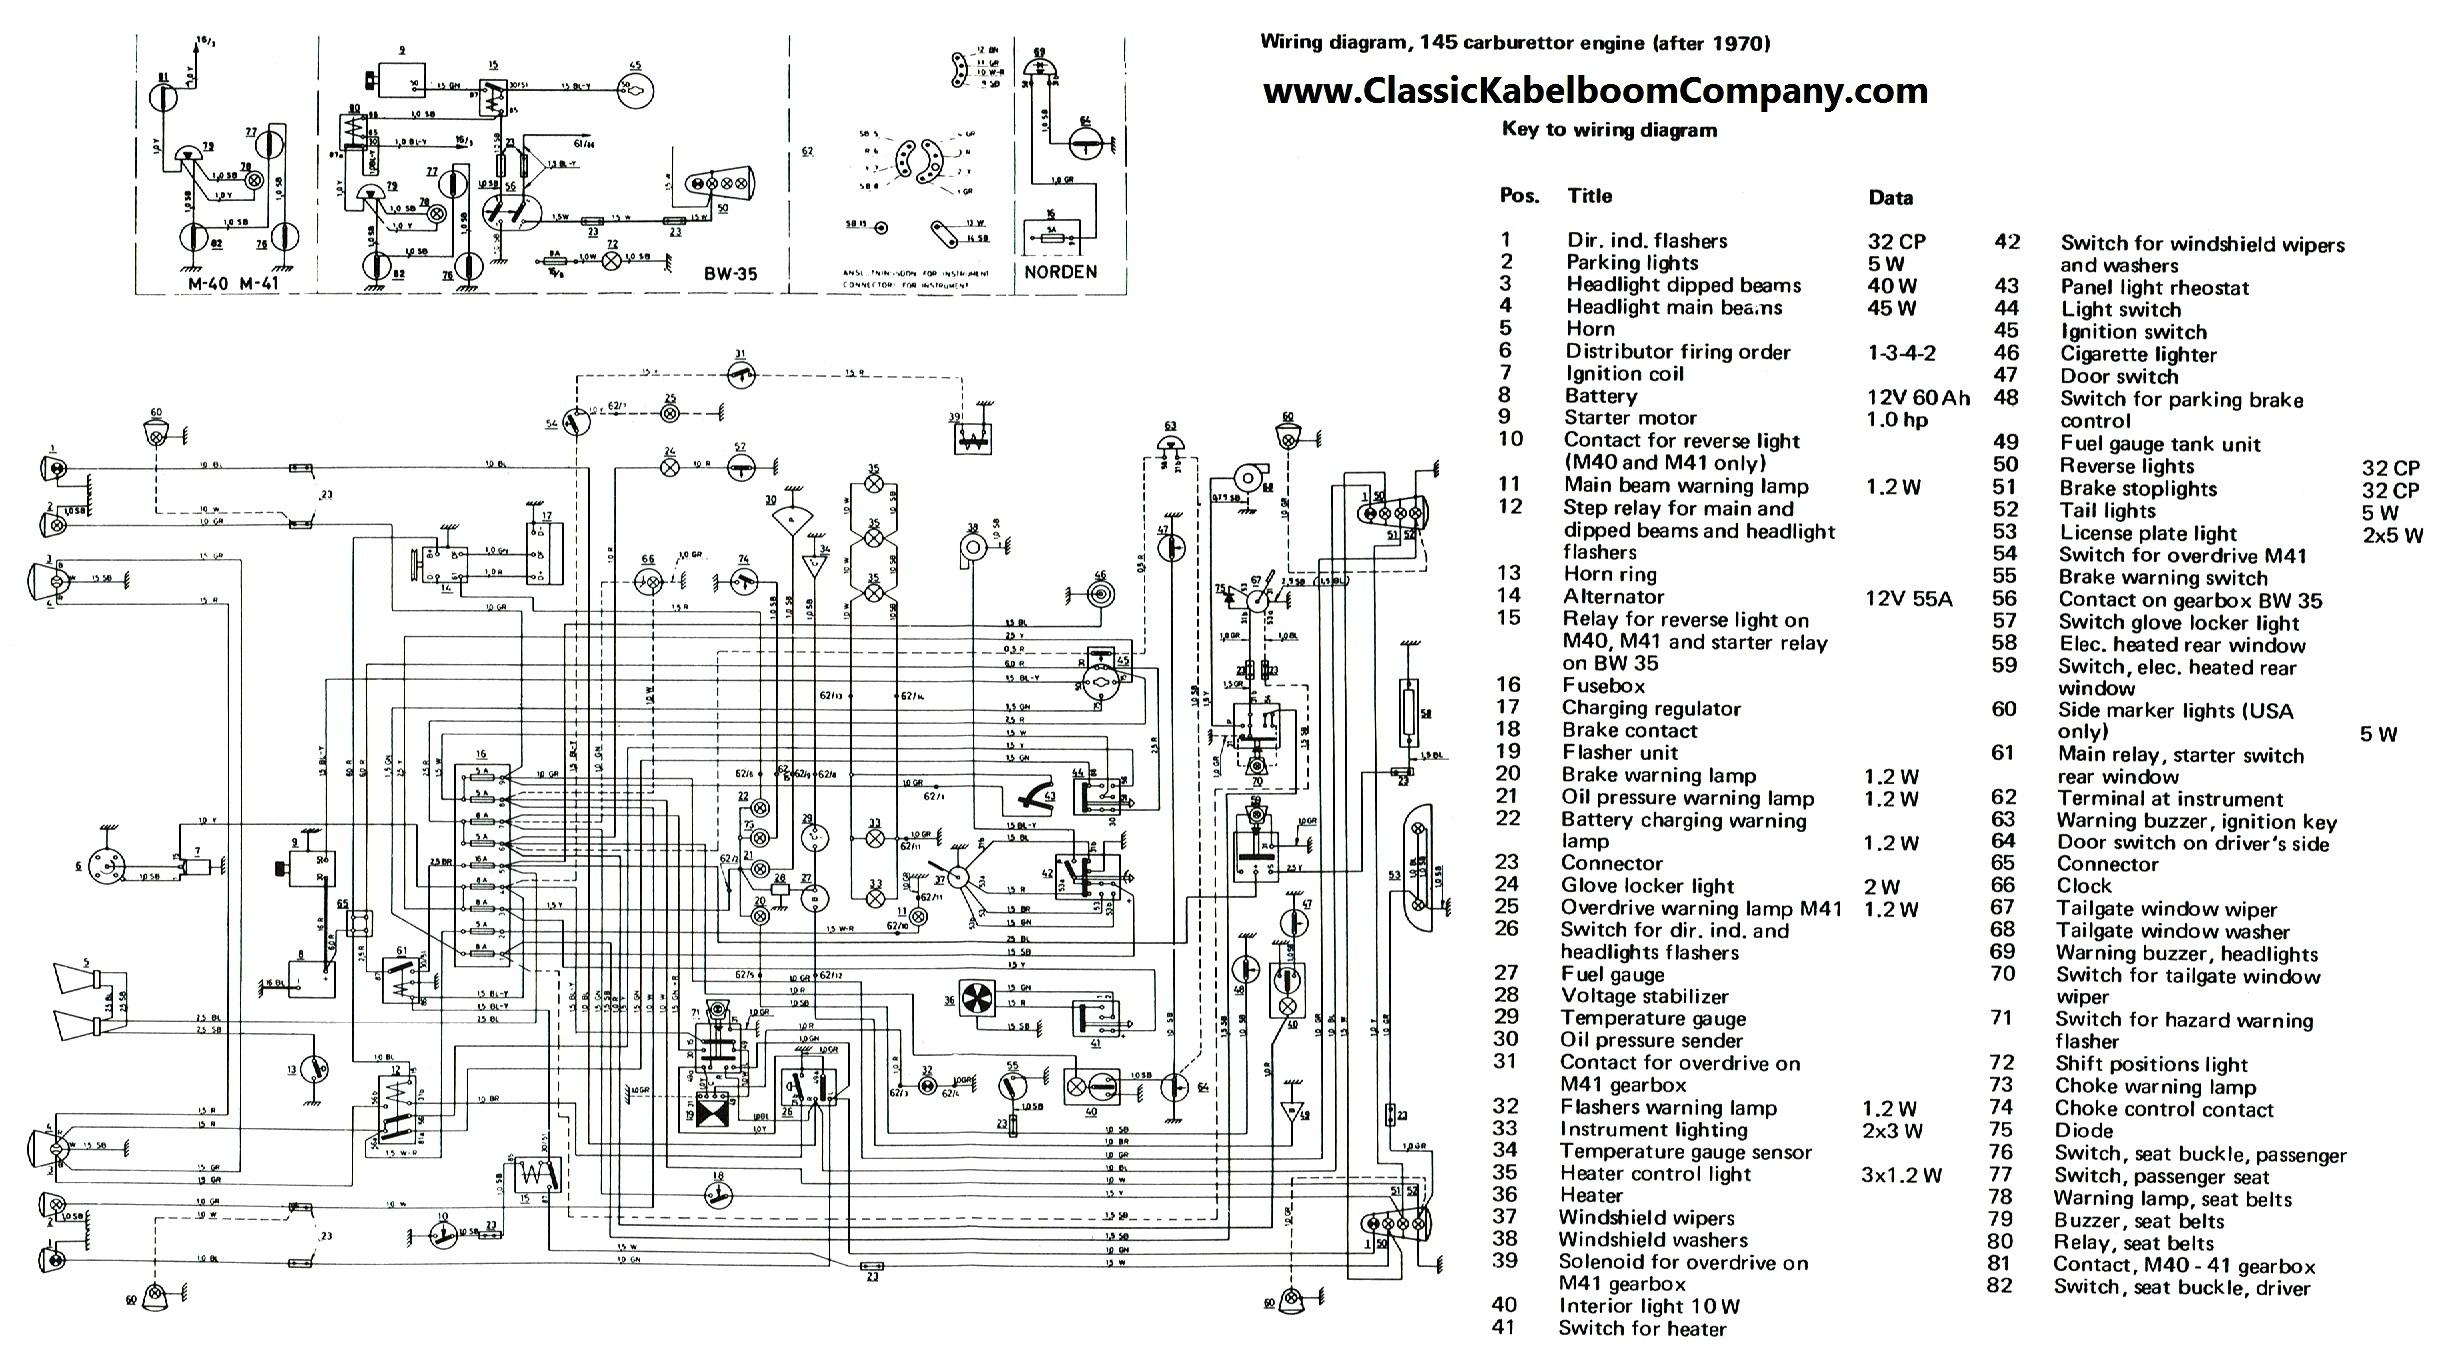 vol20?cdp=a classic kabelboom company elektrisch bedrading schema volvo 1973 Volvo 142 at reclaimingppi.co